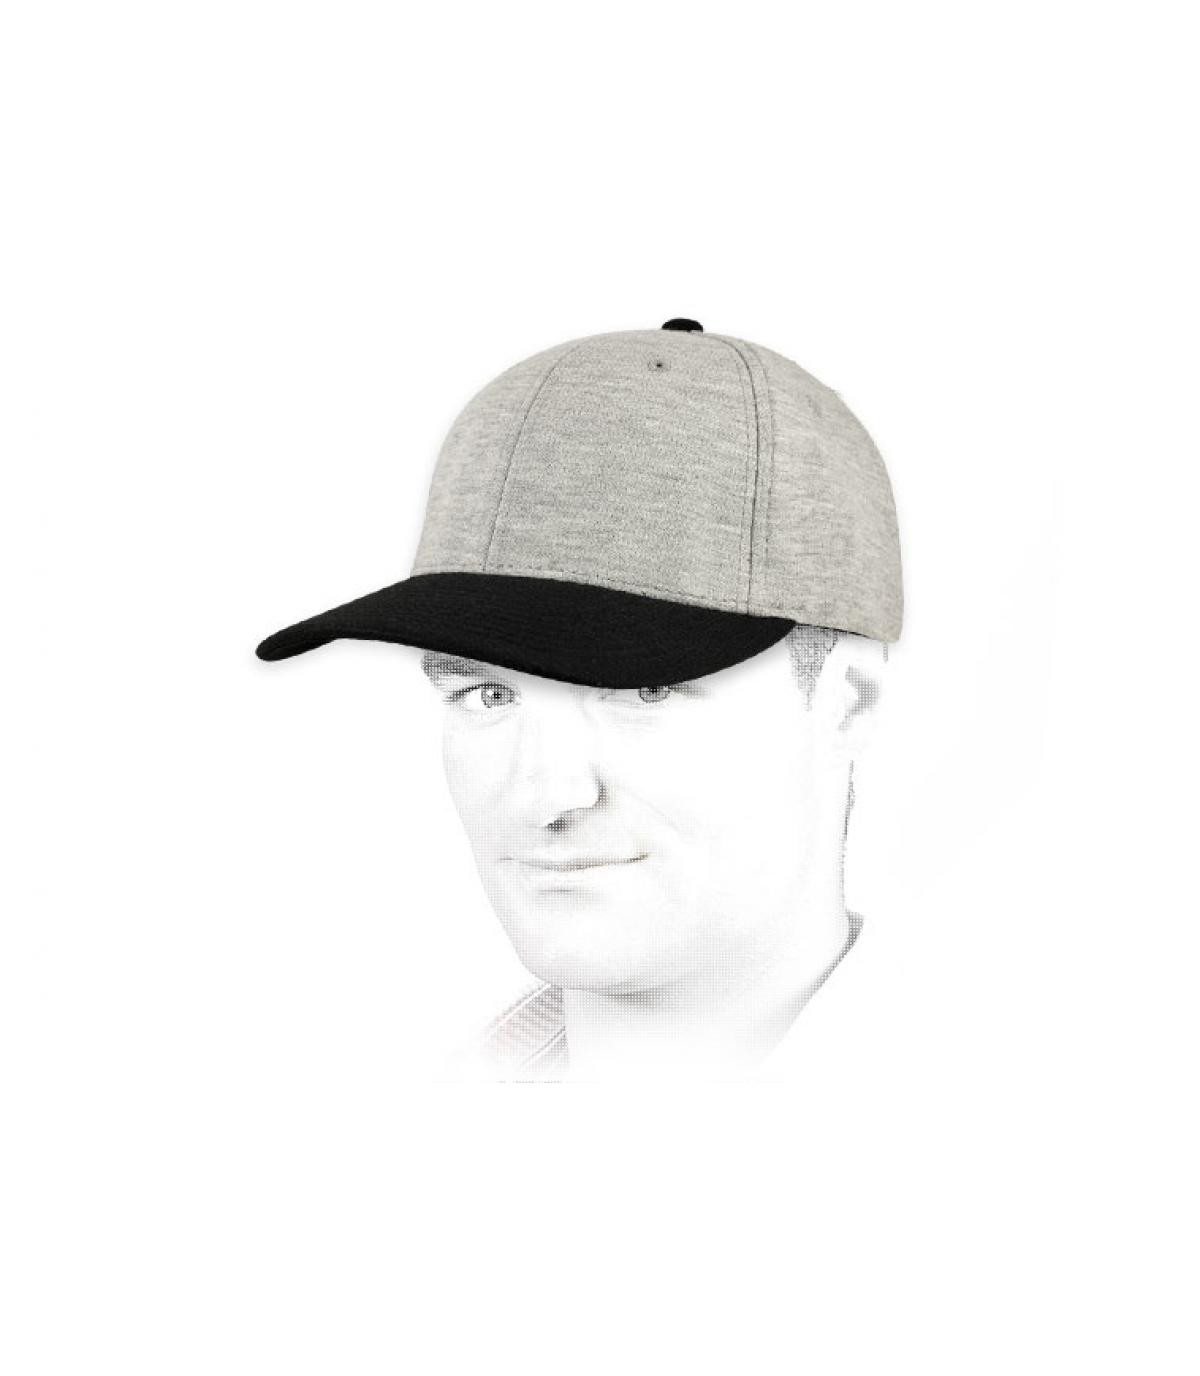 Grey black jersey cap flexfit